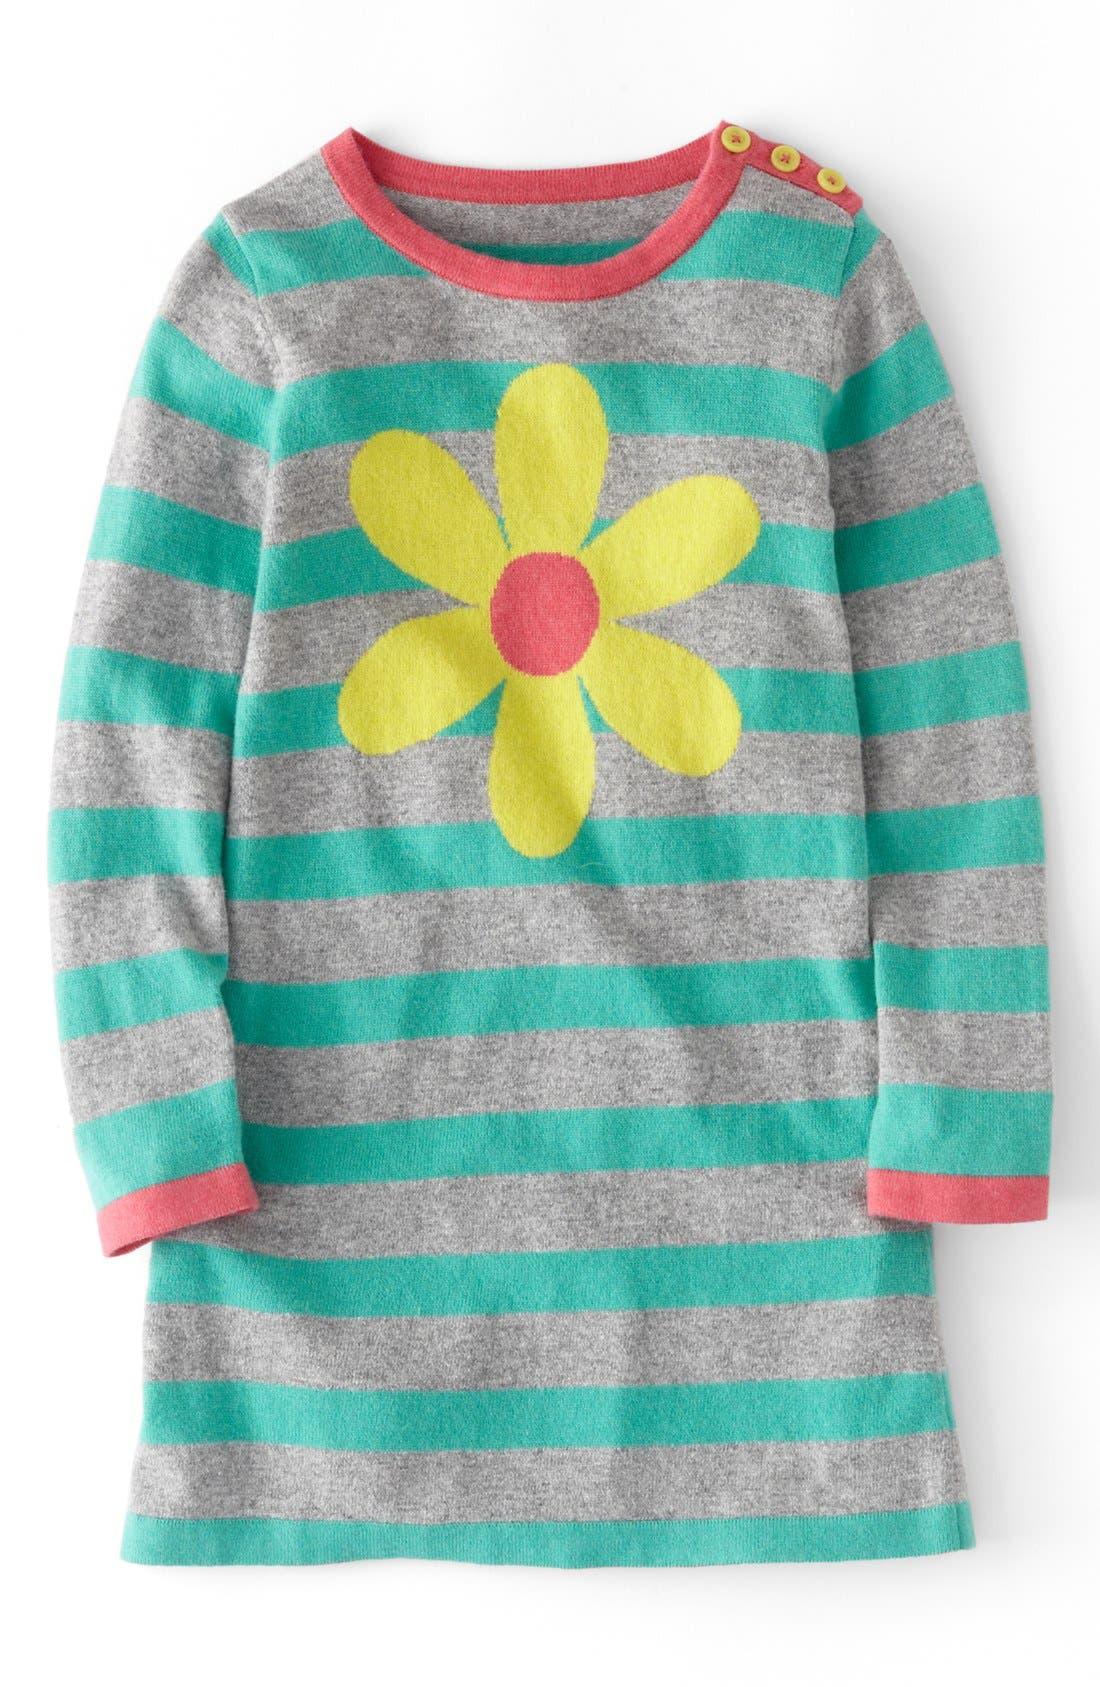 Main Image - Mini Boden Stripy Knit Dress (Toddler Girls, Little Girls & Big Girls)